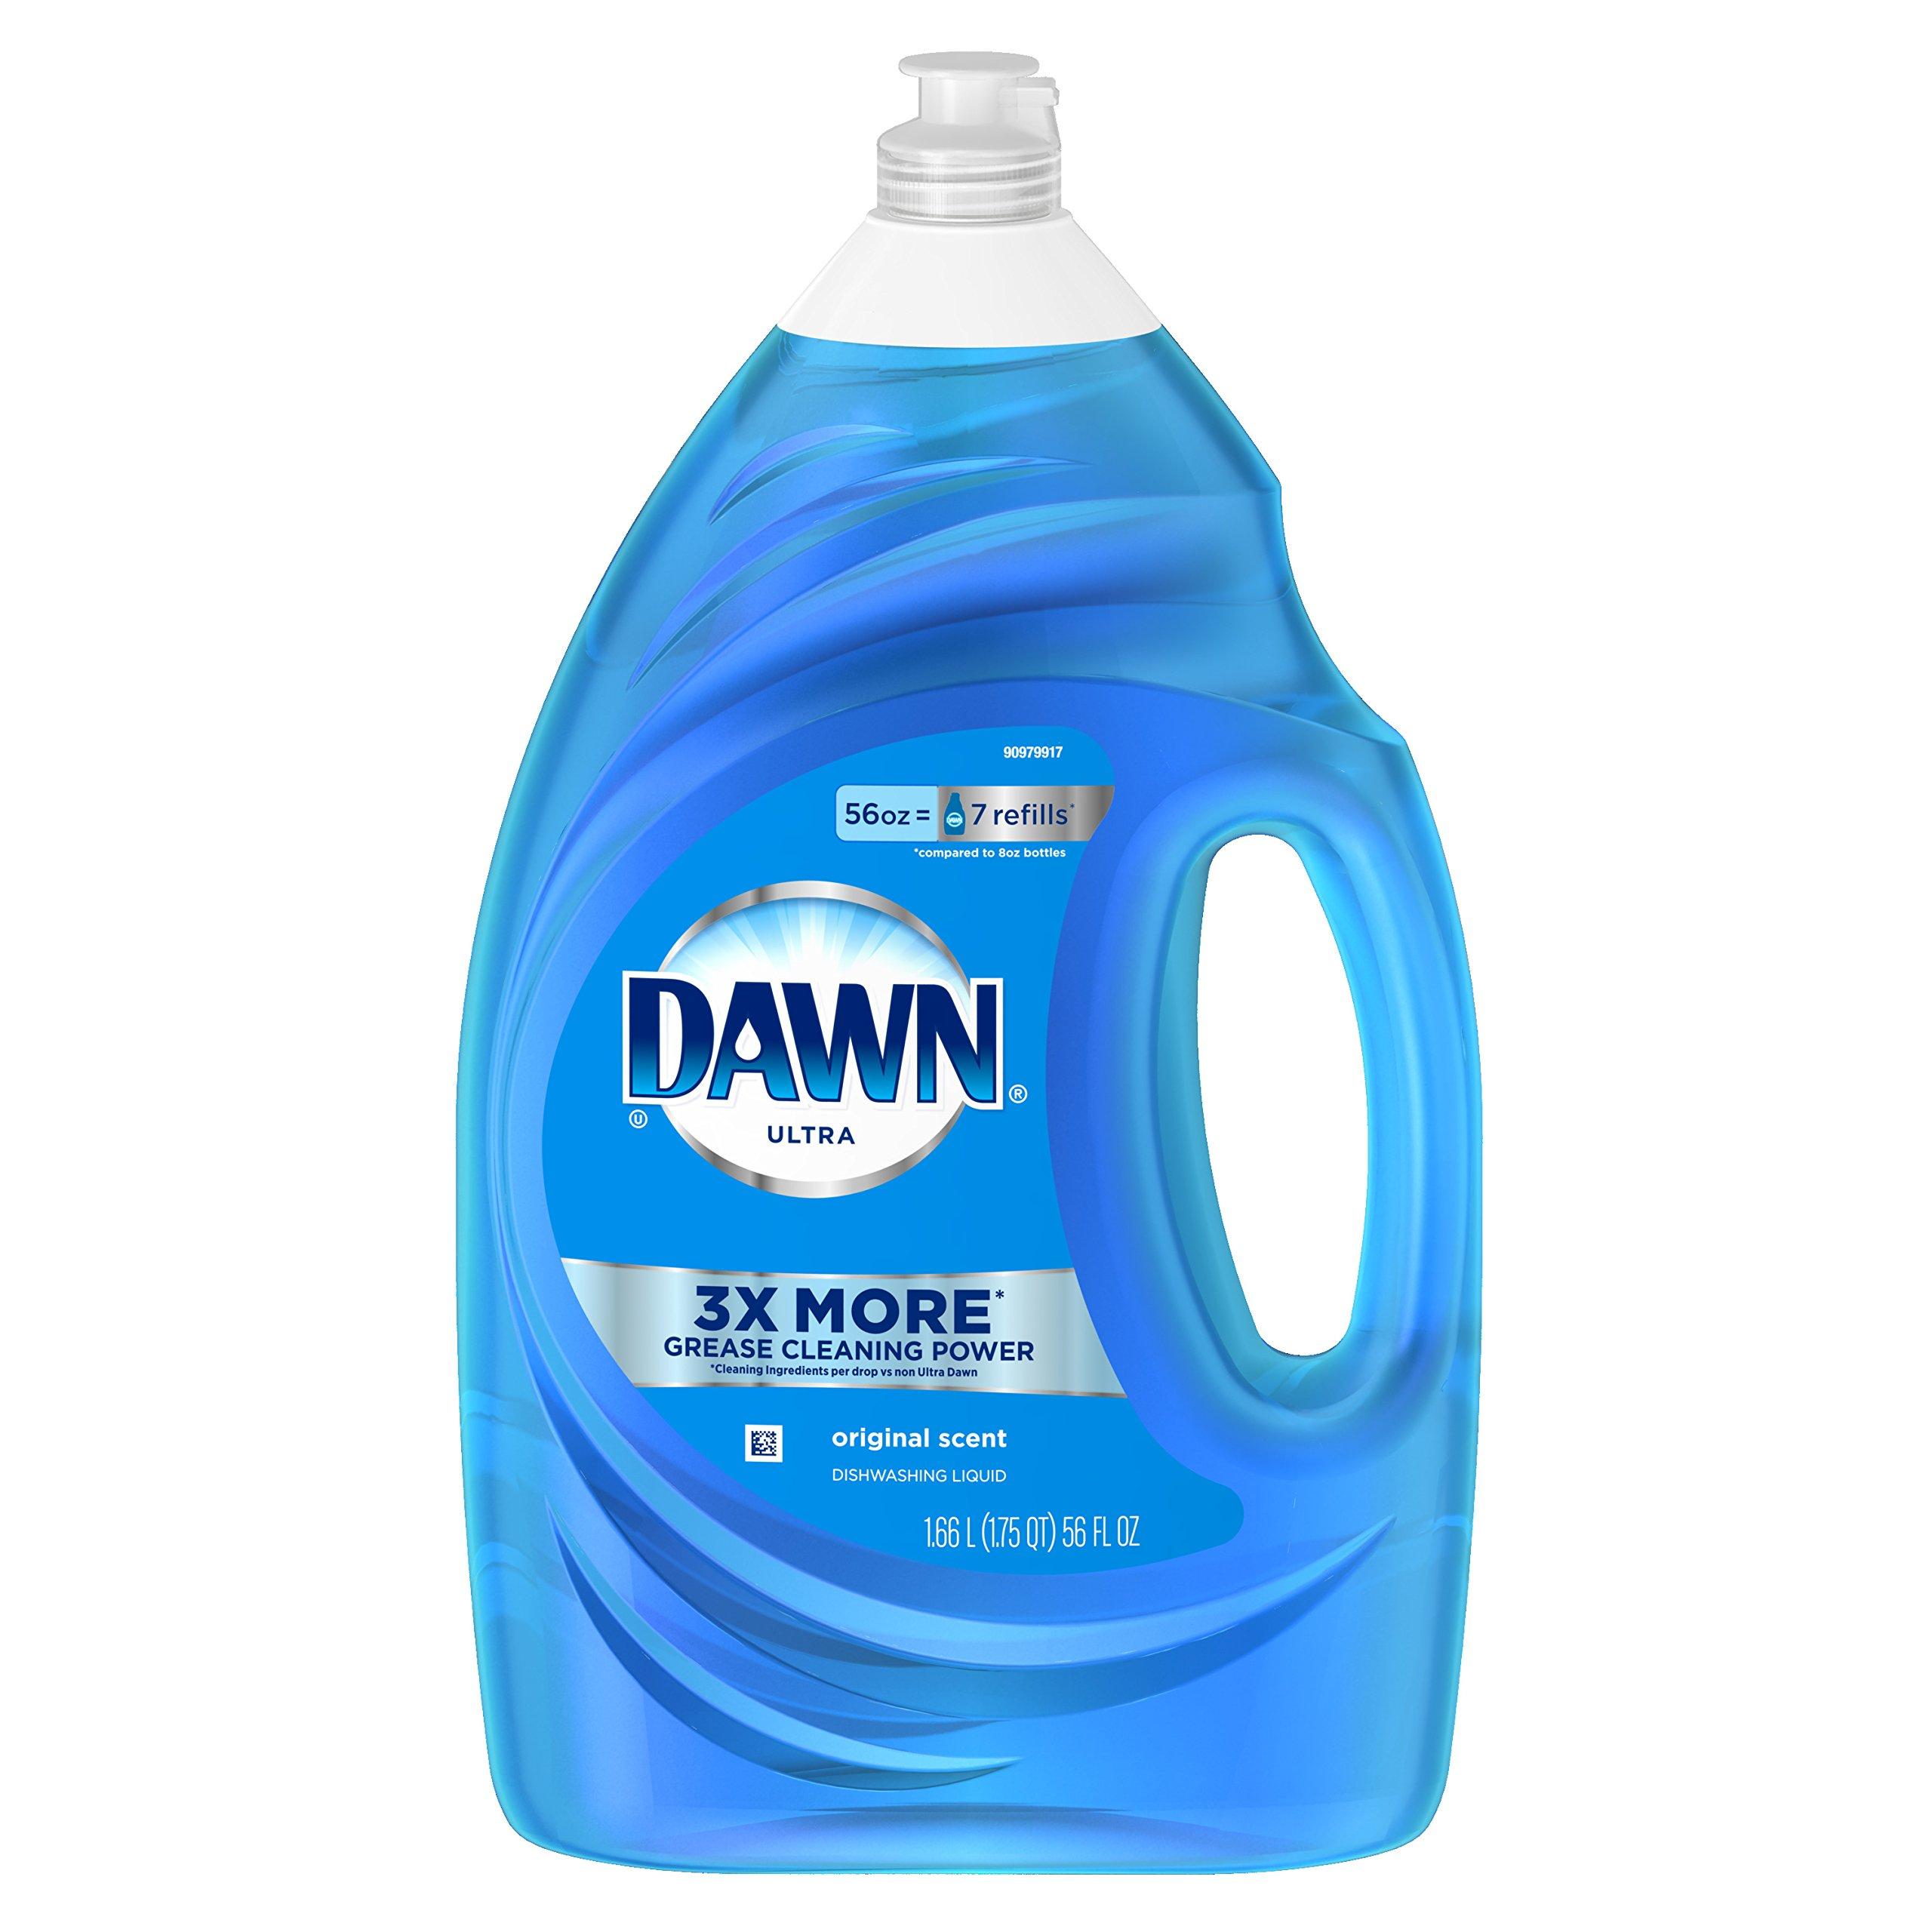 Dawn Dish Soap, Ultra Dishwashing Liquid, Original Scent, 56 fl oz, 1-Pack